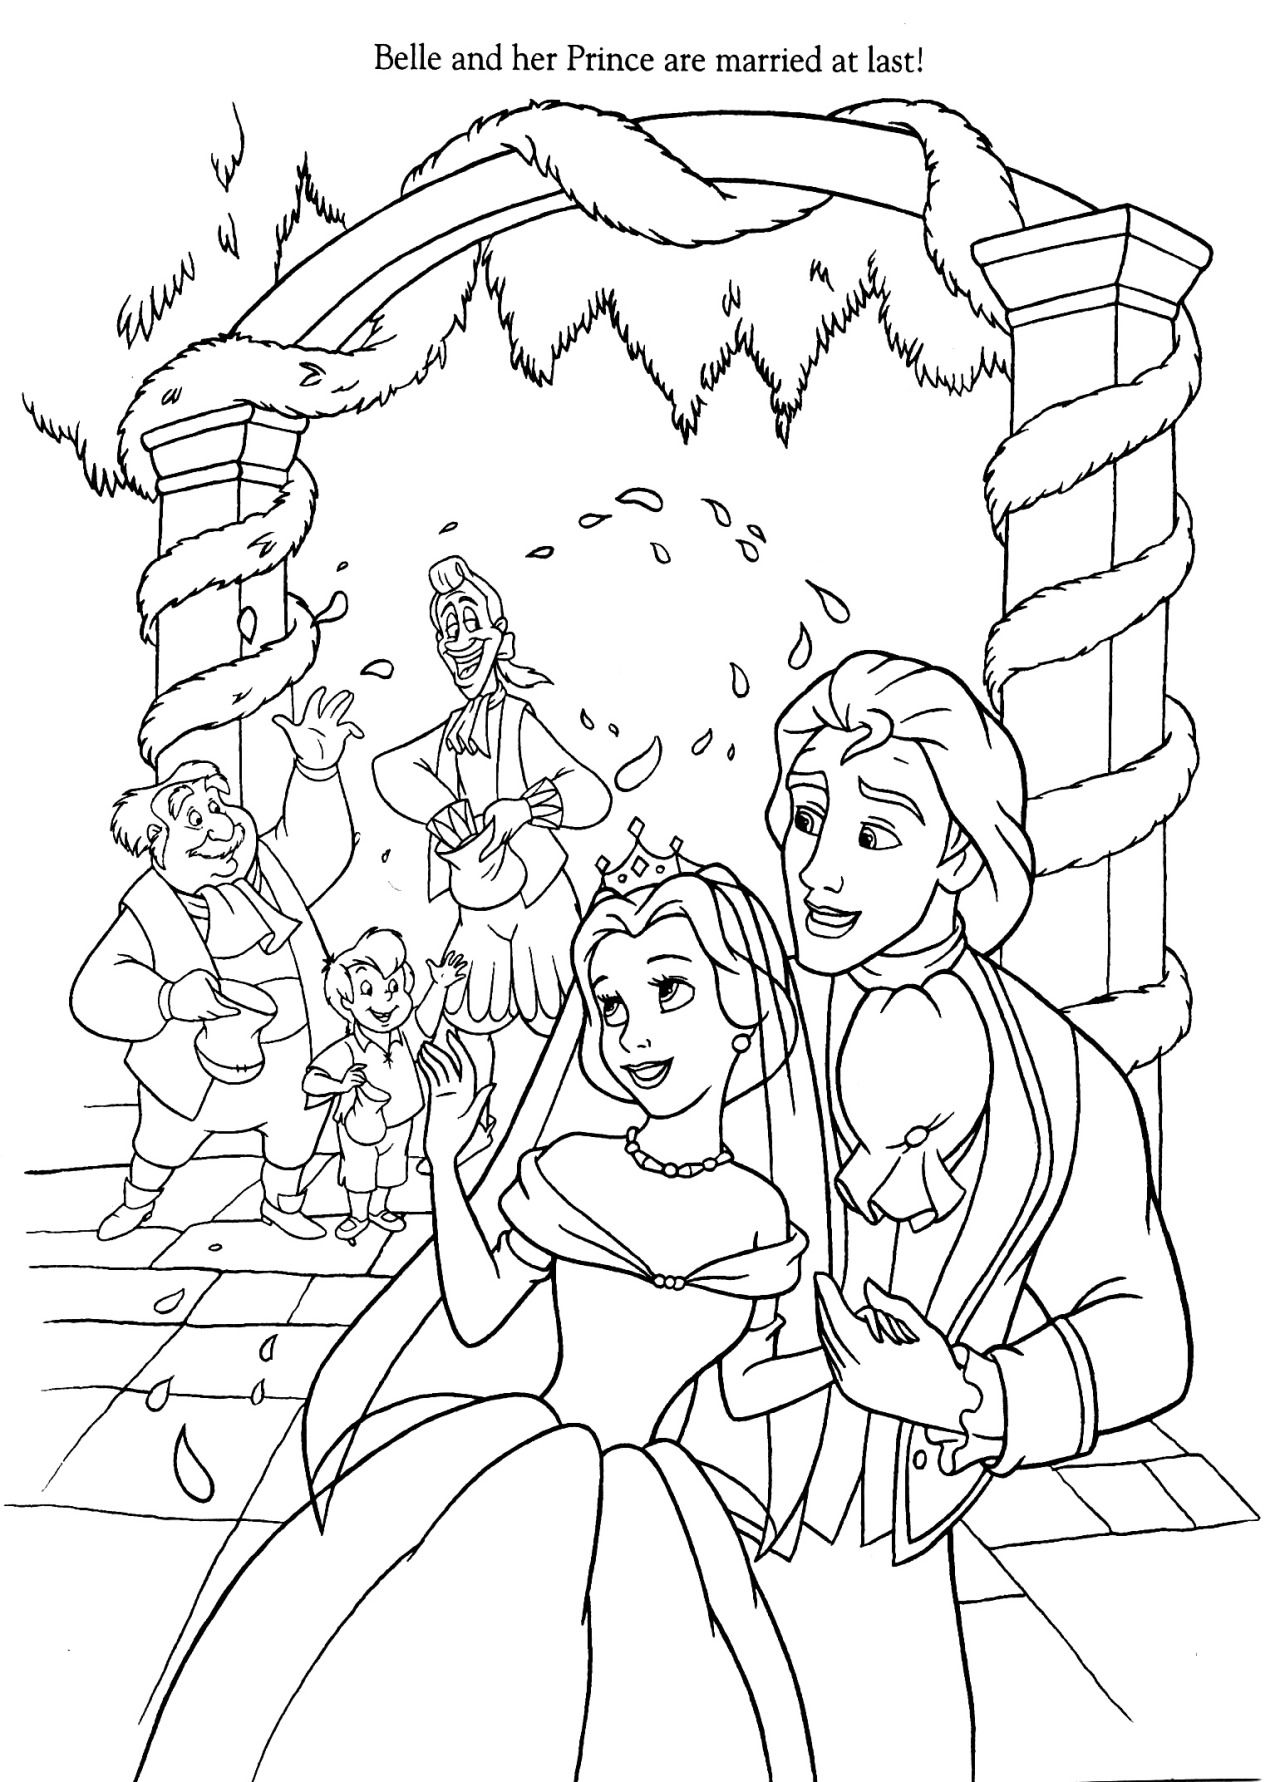 Pin By Delphine Van Brackel On Belle En Het Beest Wedding Coloring Pages Disney Coloring Pages Cinderella Coloring Pages